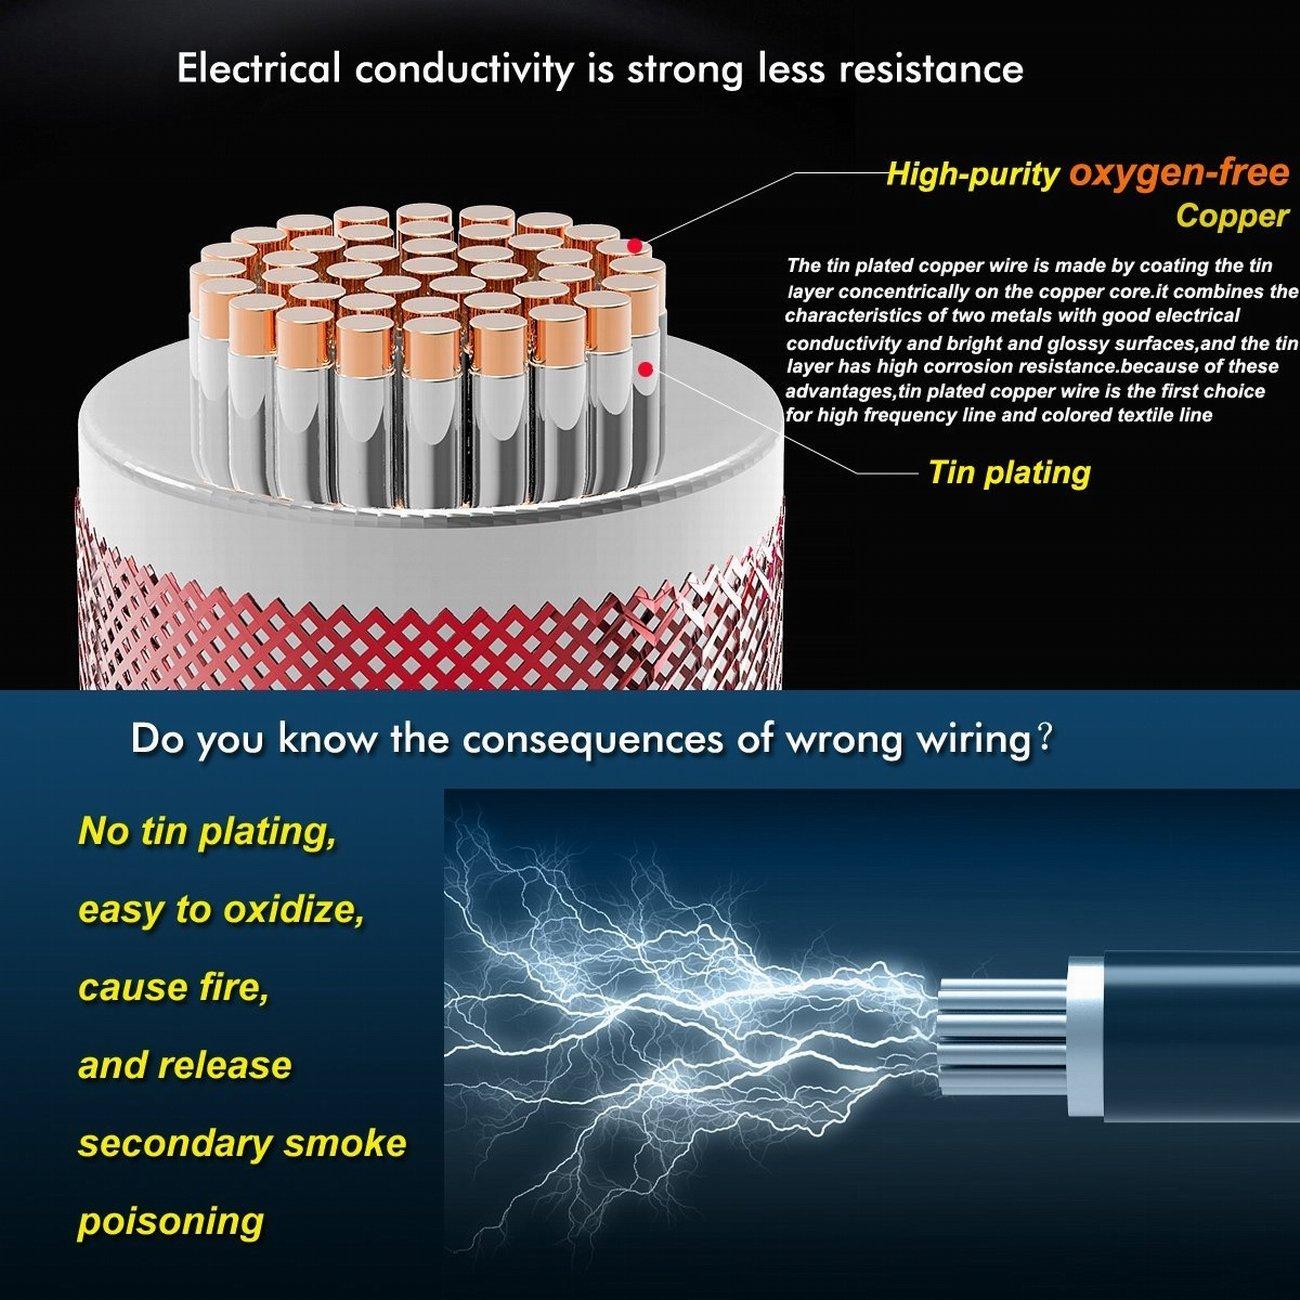 Cable de conexi/ón de 300 V de alta resistencia a la temperatura Cable de calibre 24 6 bobinas de 9 metros de diferentes colores cable el/éctrico Kit de alambre de silicona flexible de 24 AWG